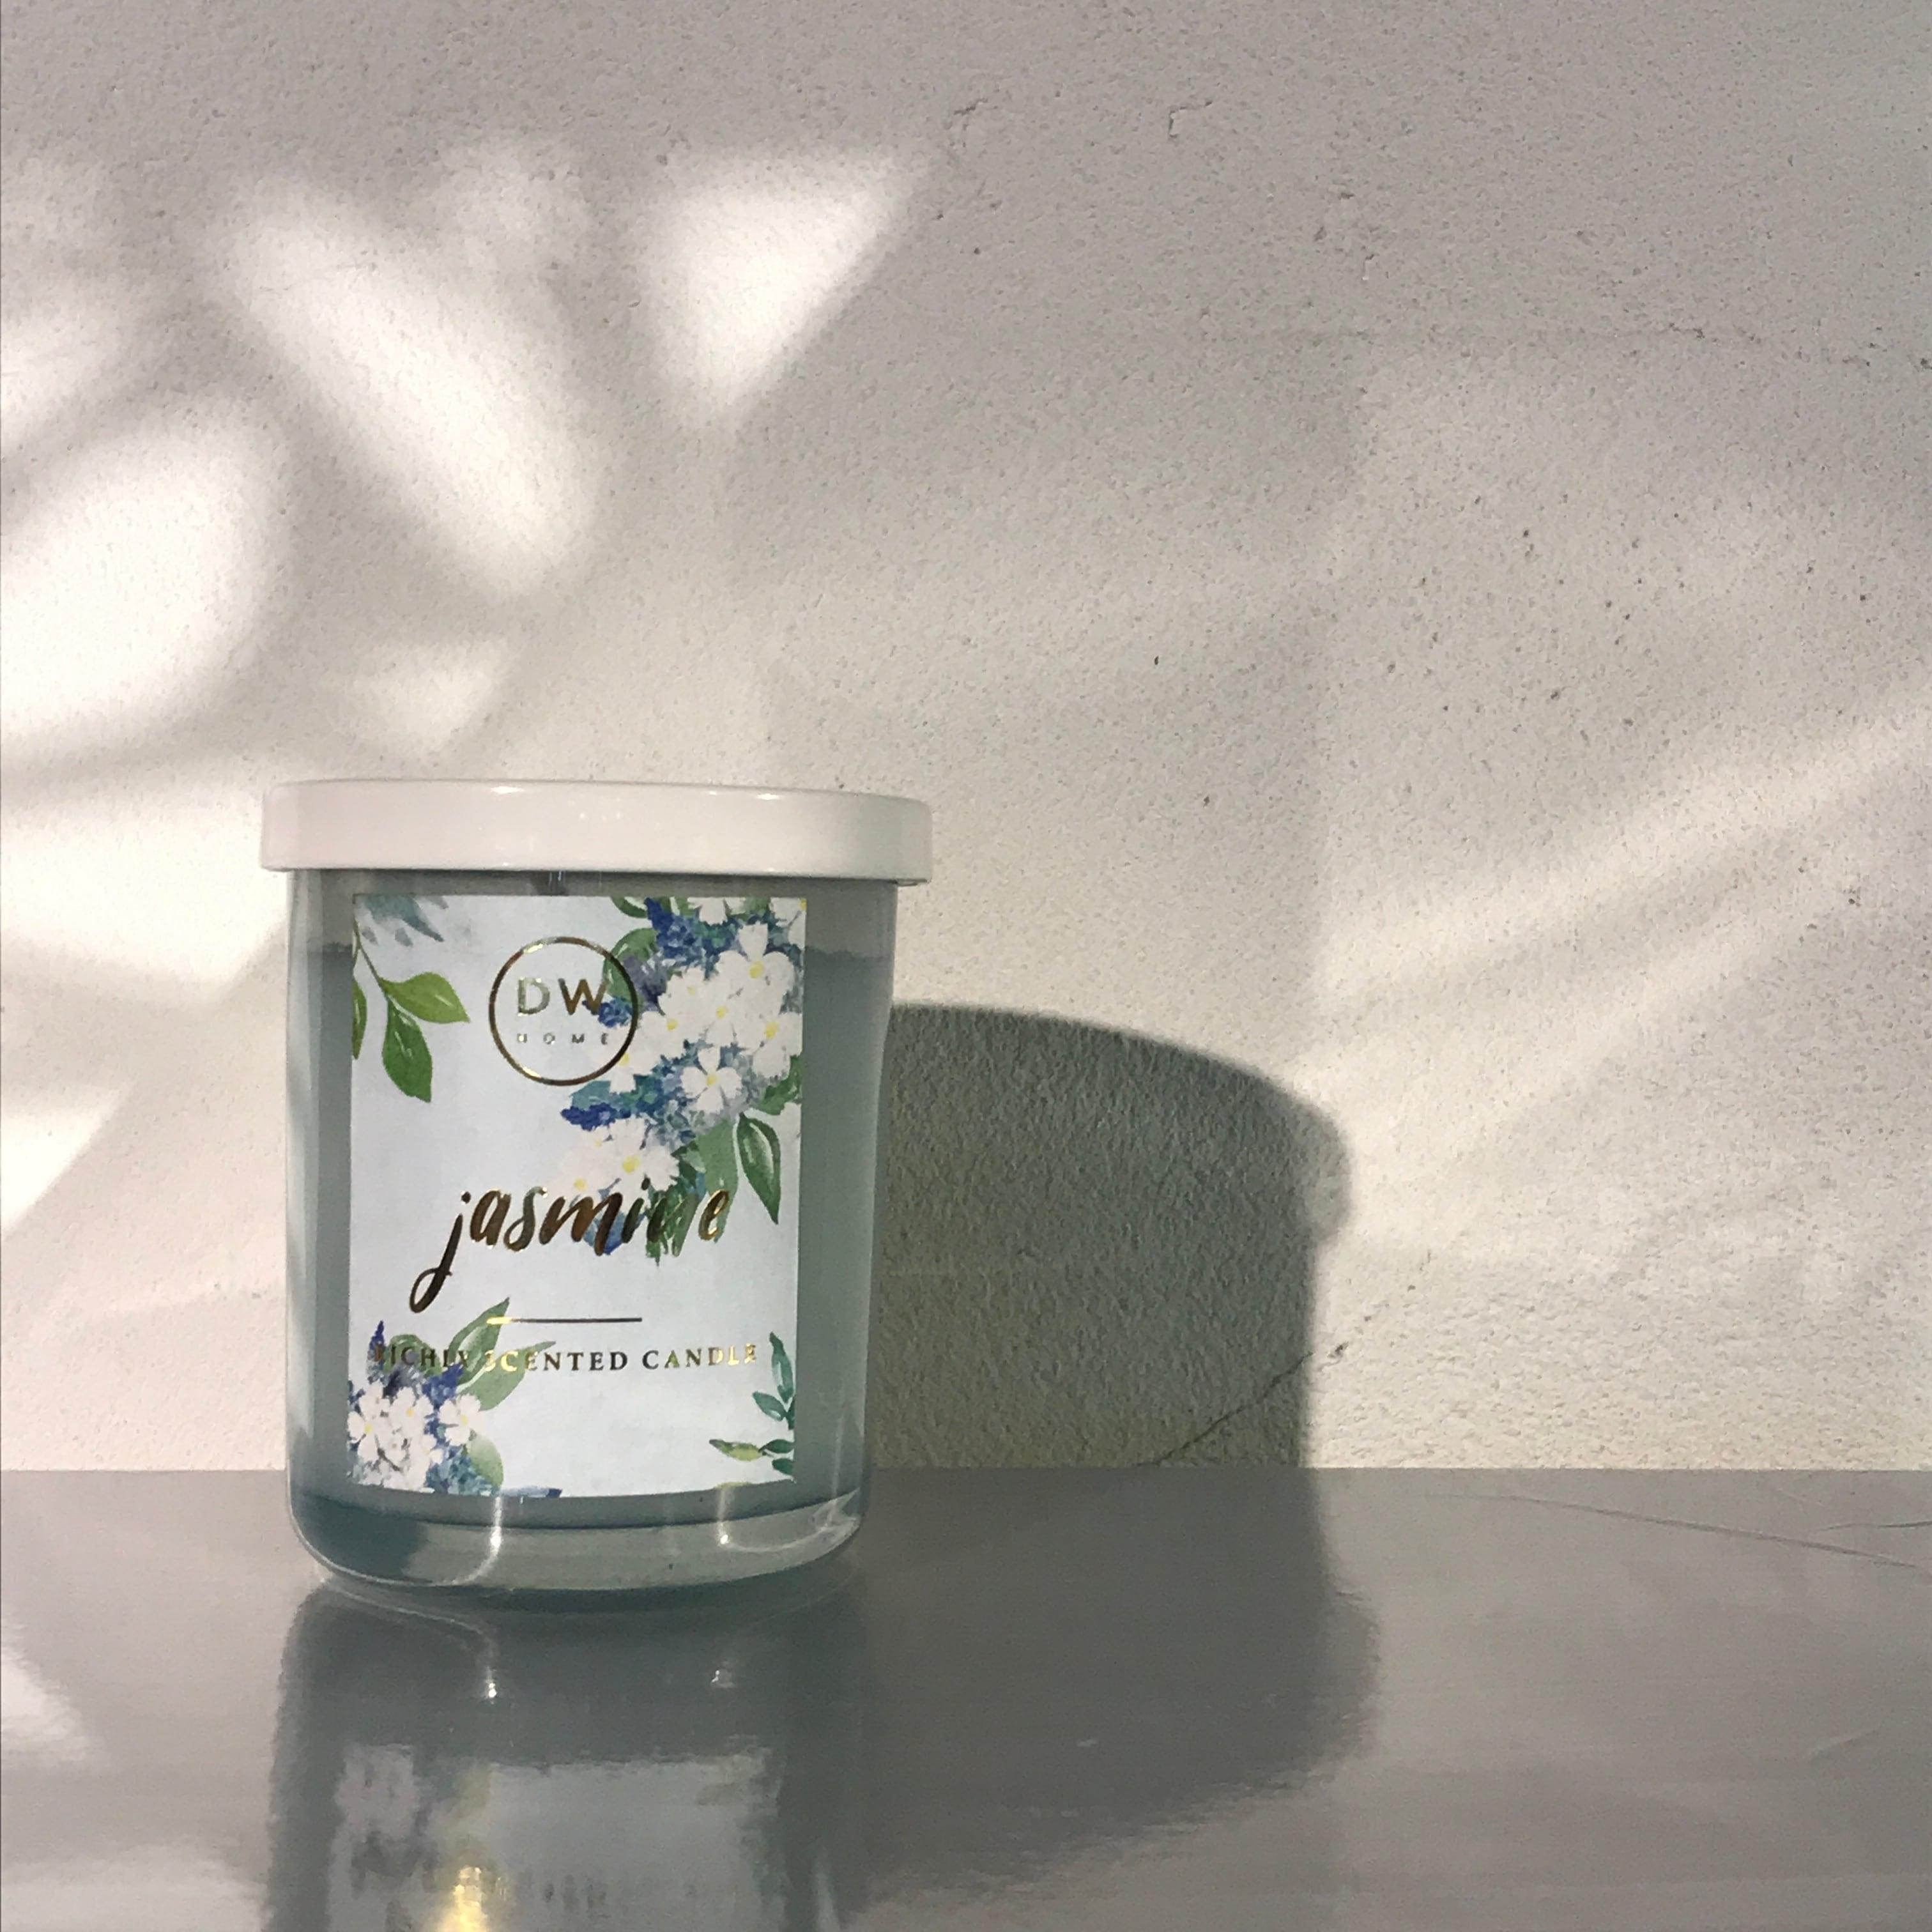 【Dw Home Candles】jasmine【アロマキャンドル】